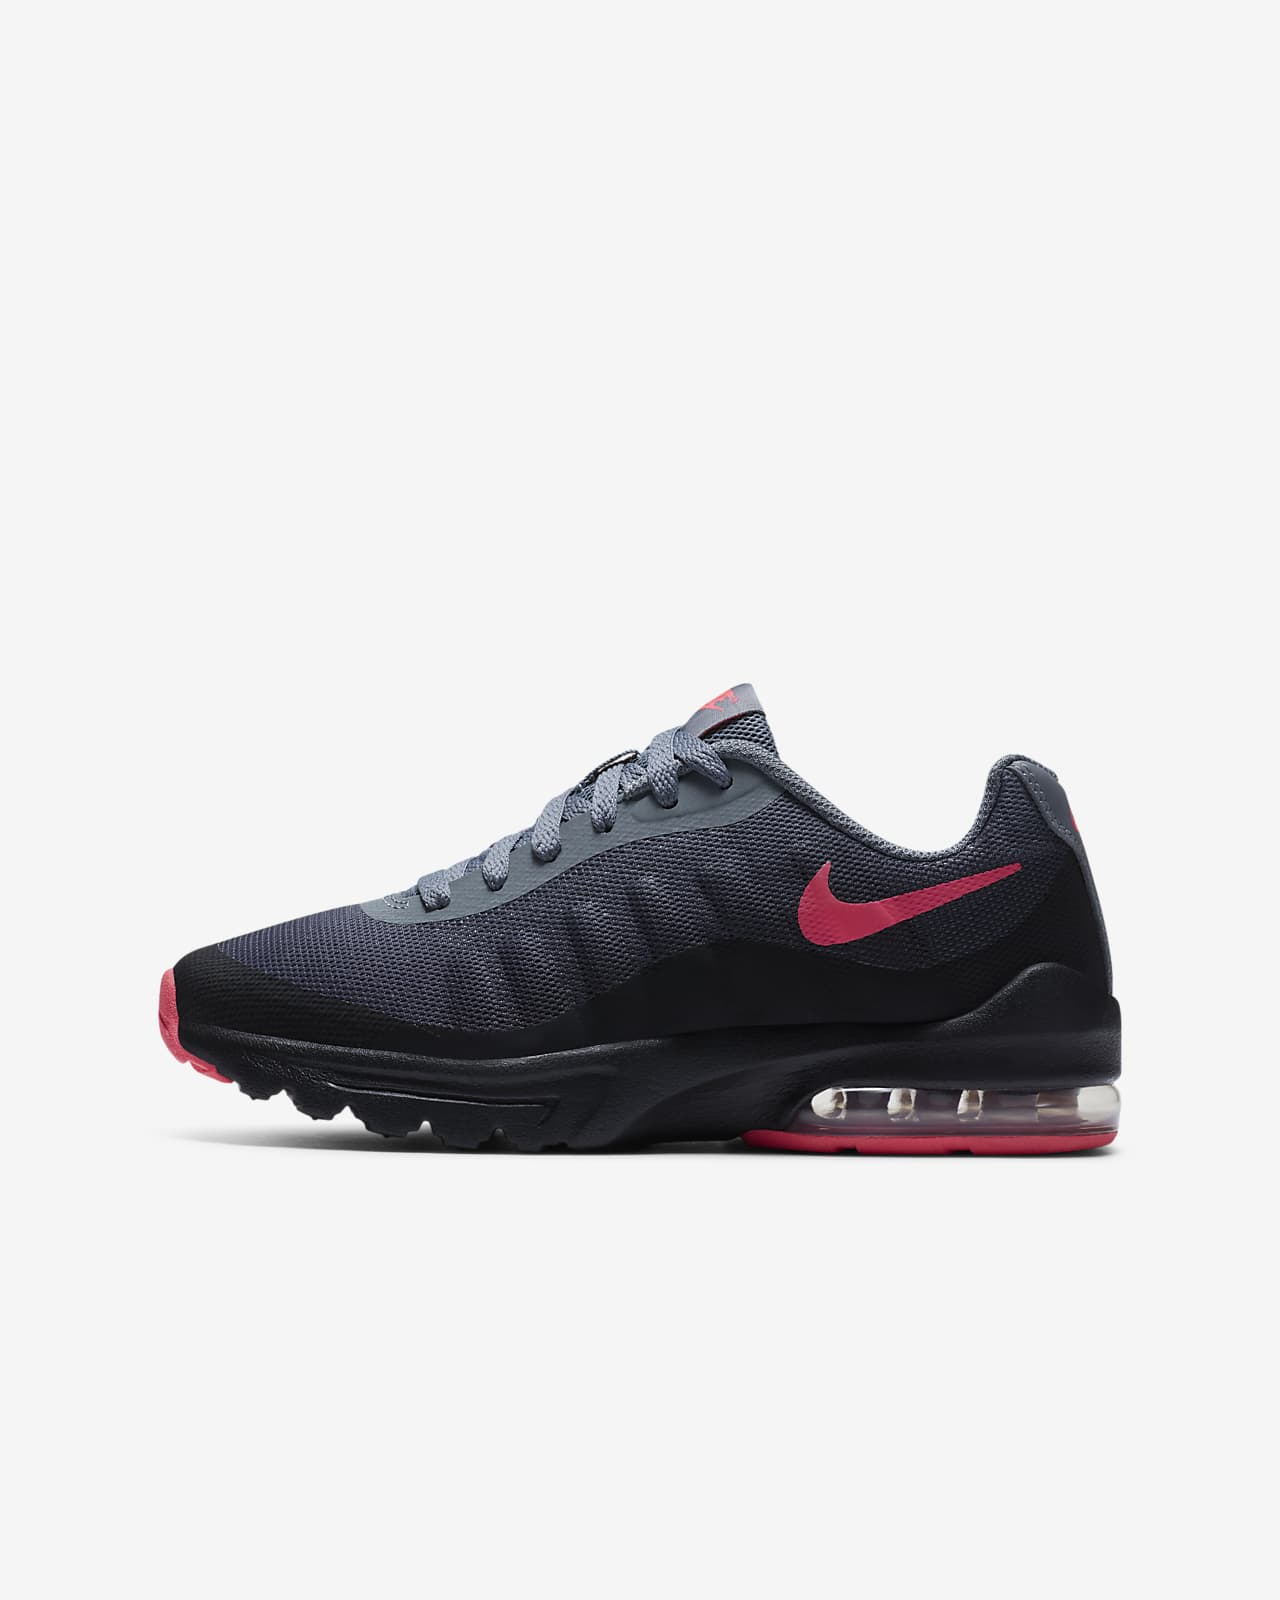 Nike Air Max Invigor gyerek futócipő (35,5–40)